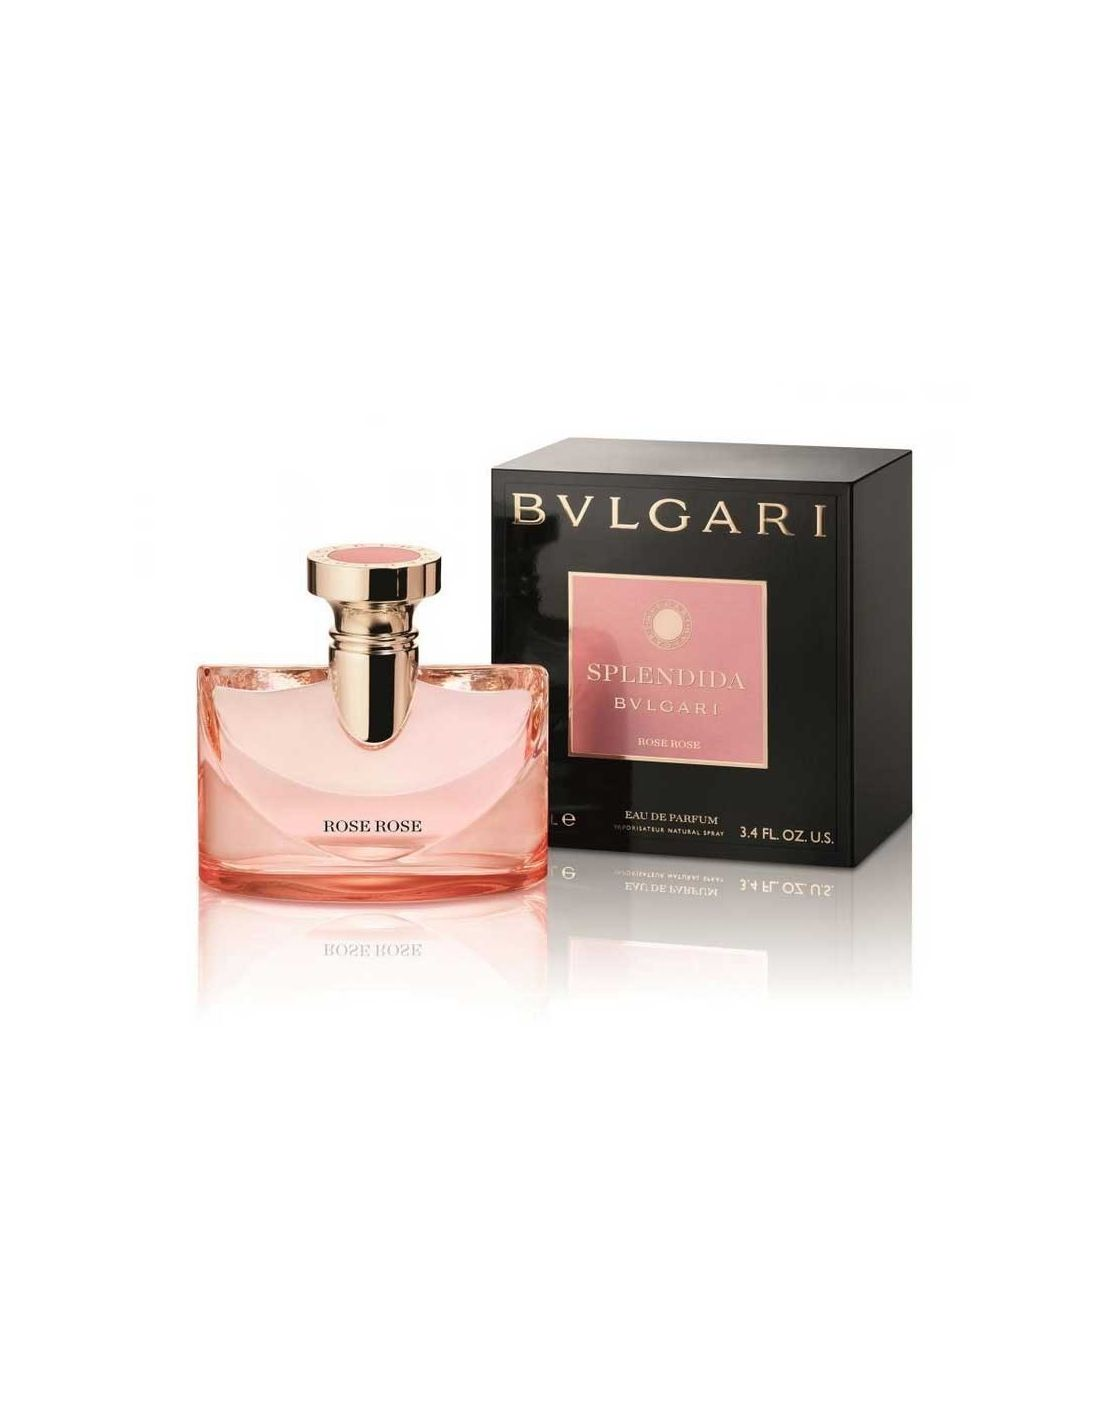 876cb8b82ea Bvlgari Splendida Rose Rose Eau de Parfum 50 ml à venda na Perfumes ...